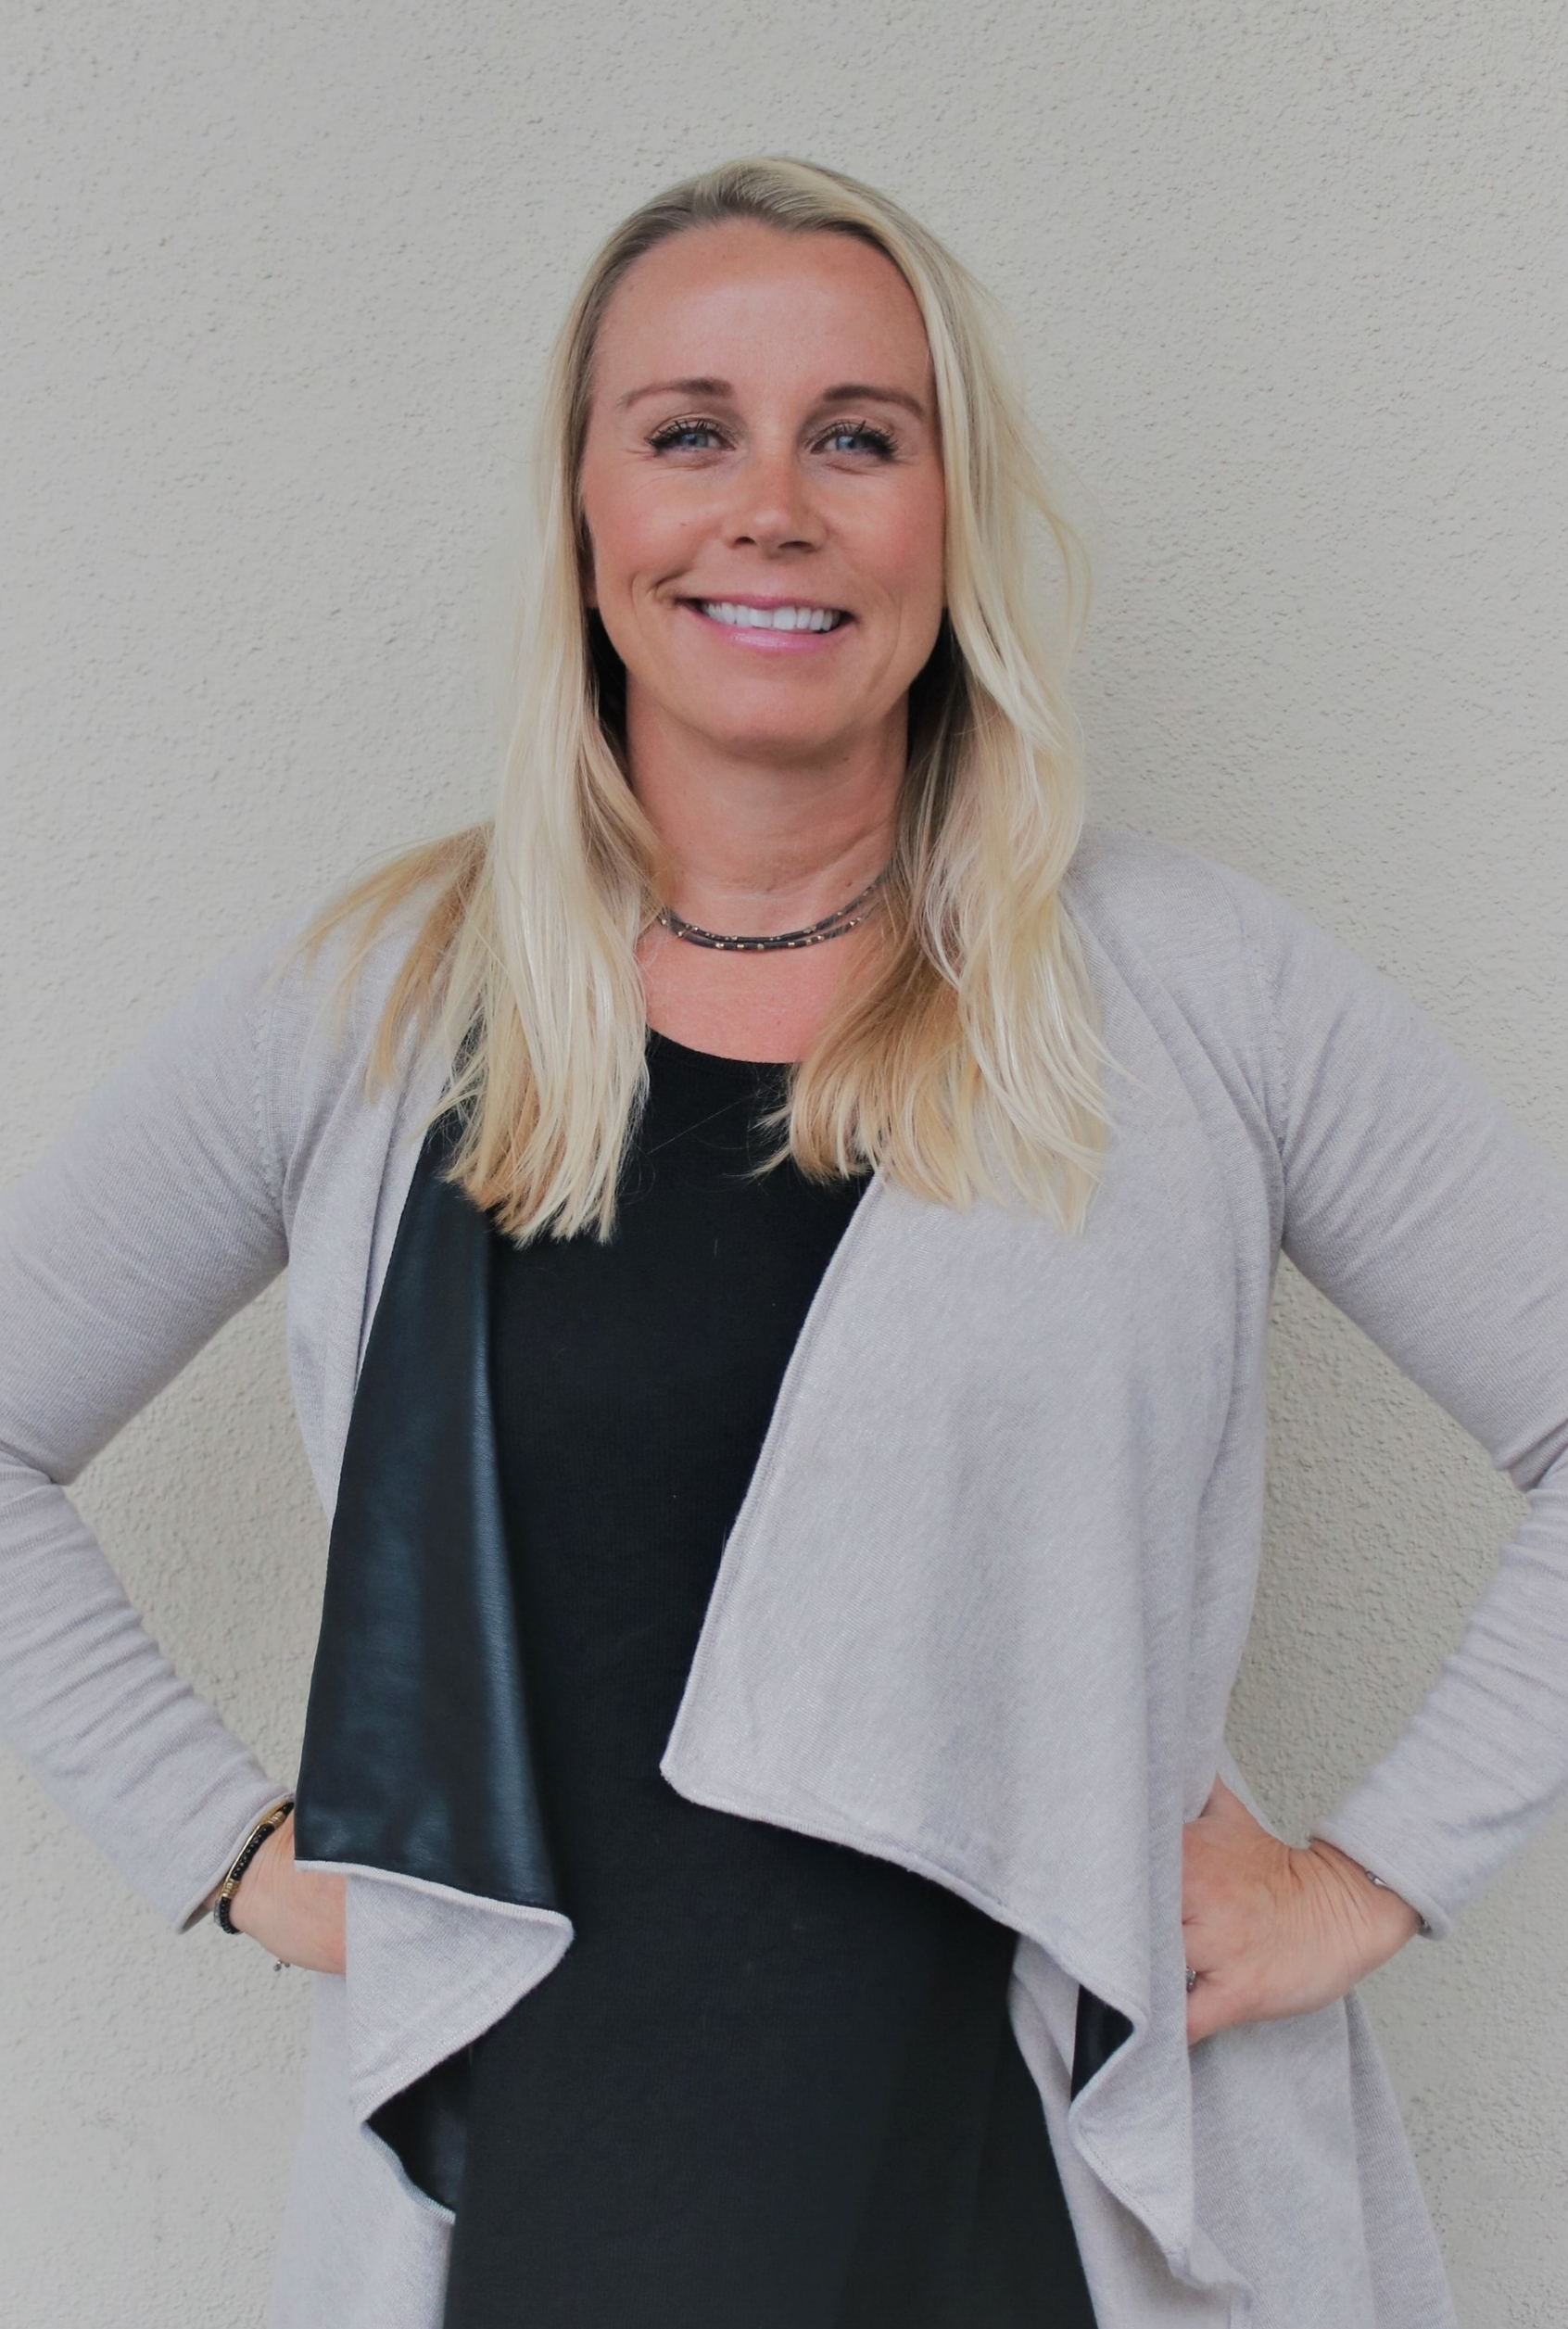 Helene Larsson-Parks - Senior Stylist, Educator